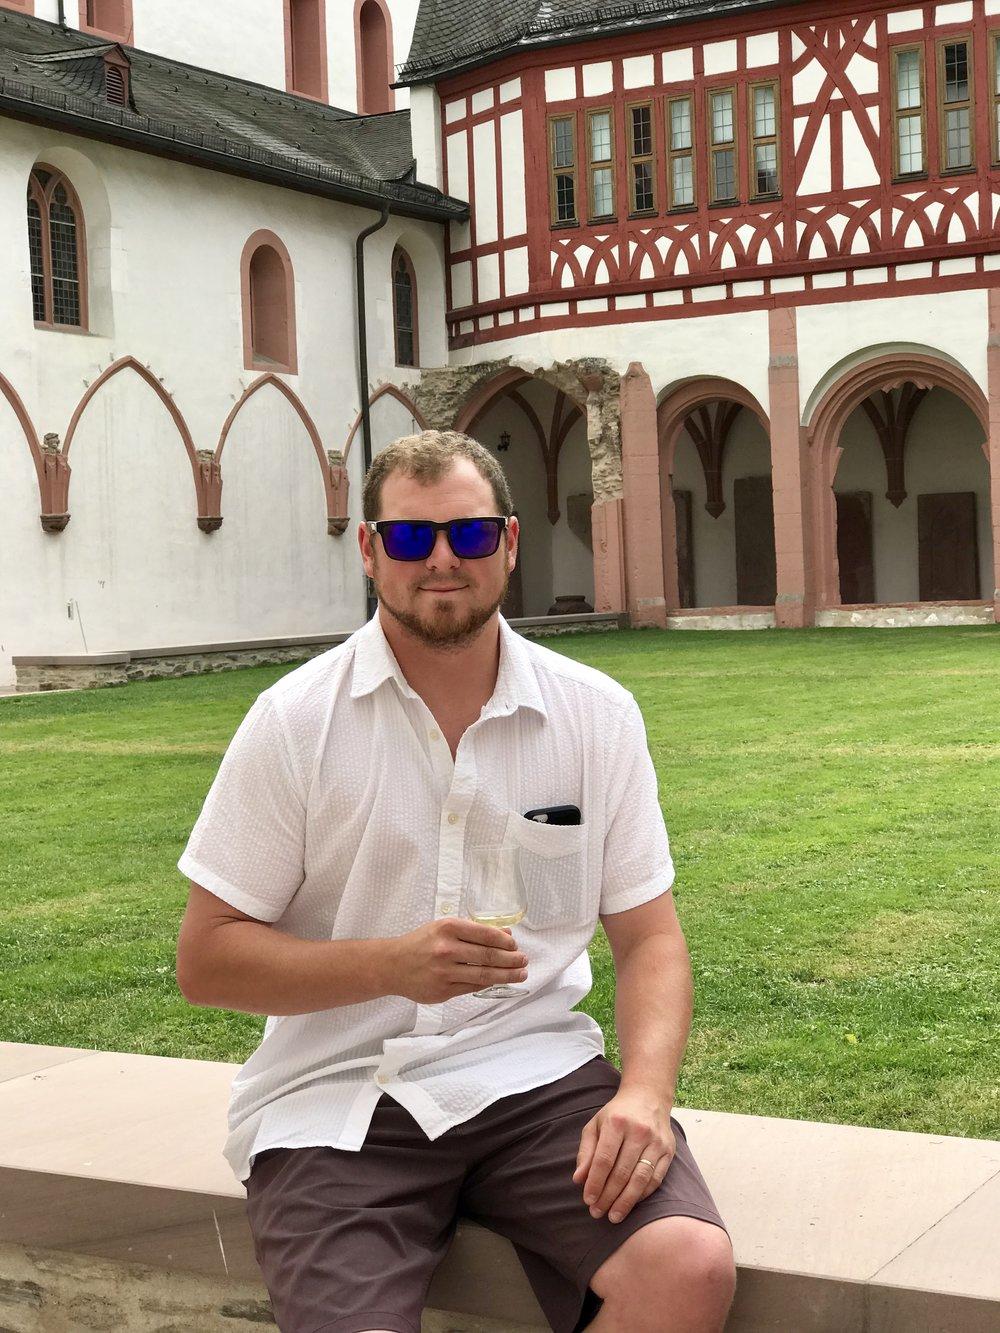 Kloster Eberbach Mr. Smitten.jpg